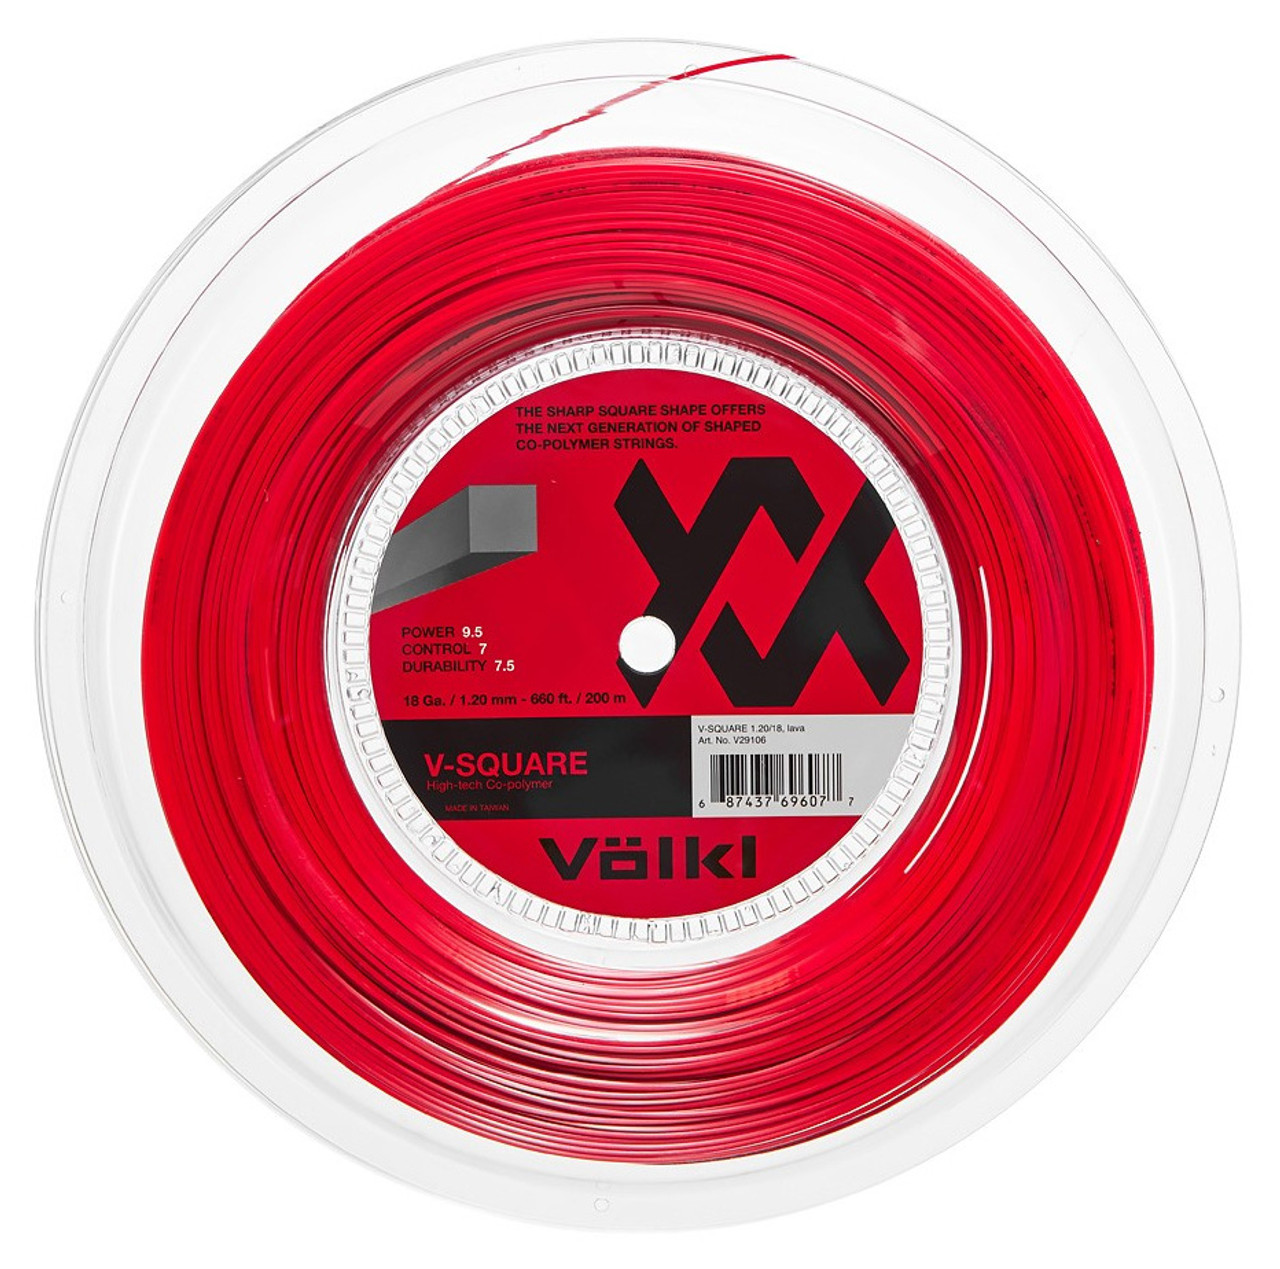 Volkl V-Square 18 1.20mm Tennis Strings Set